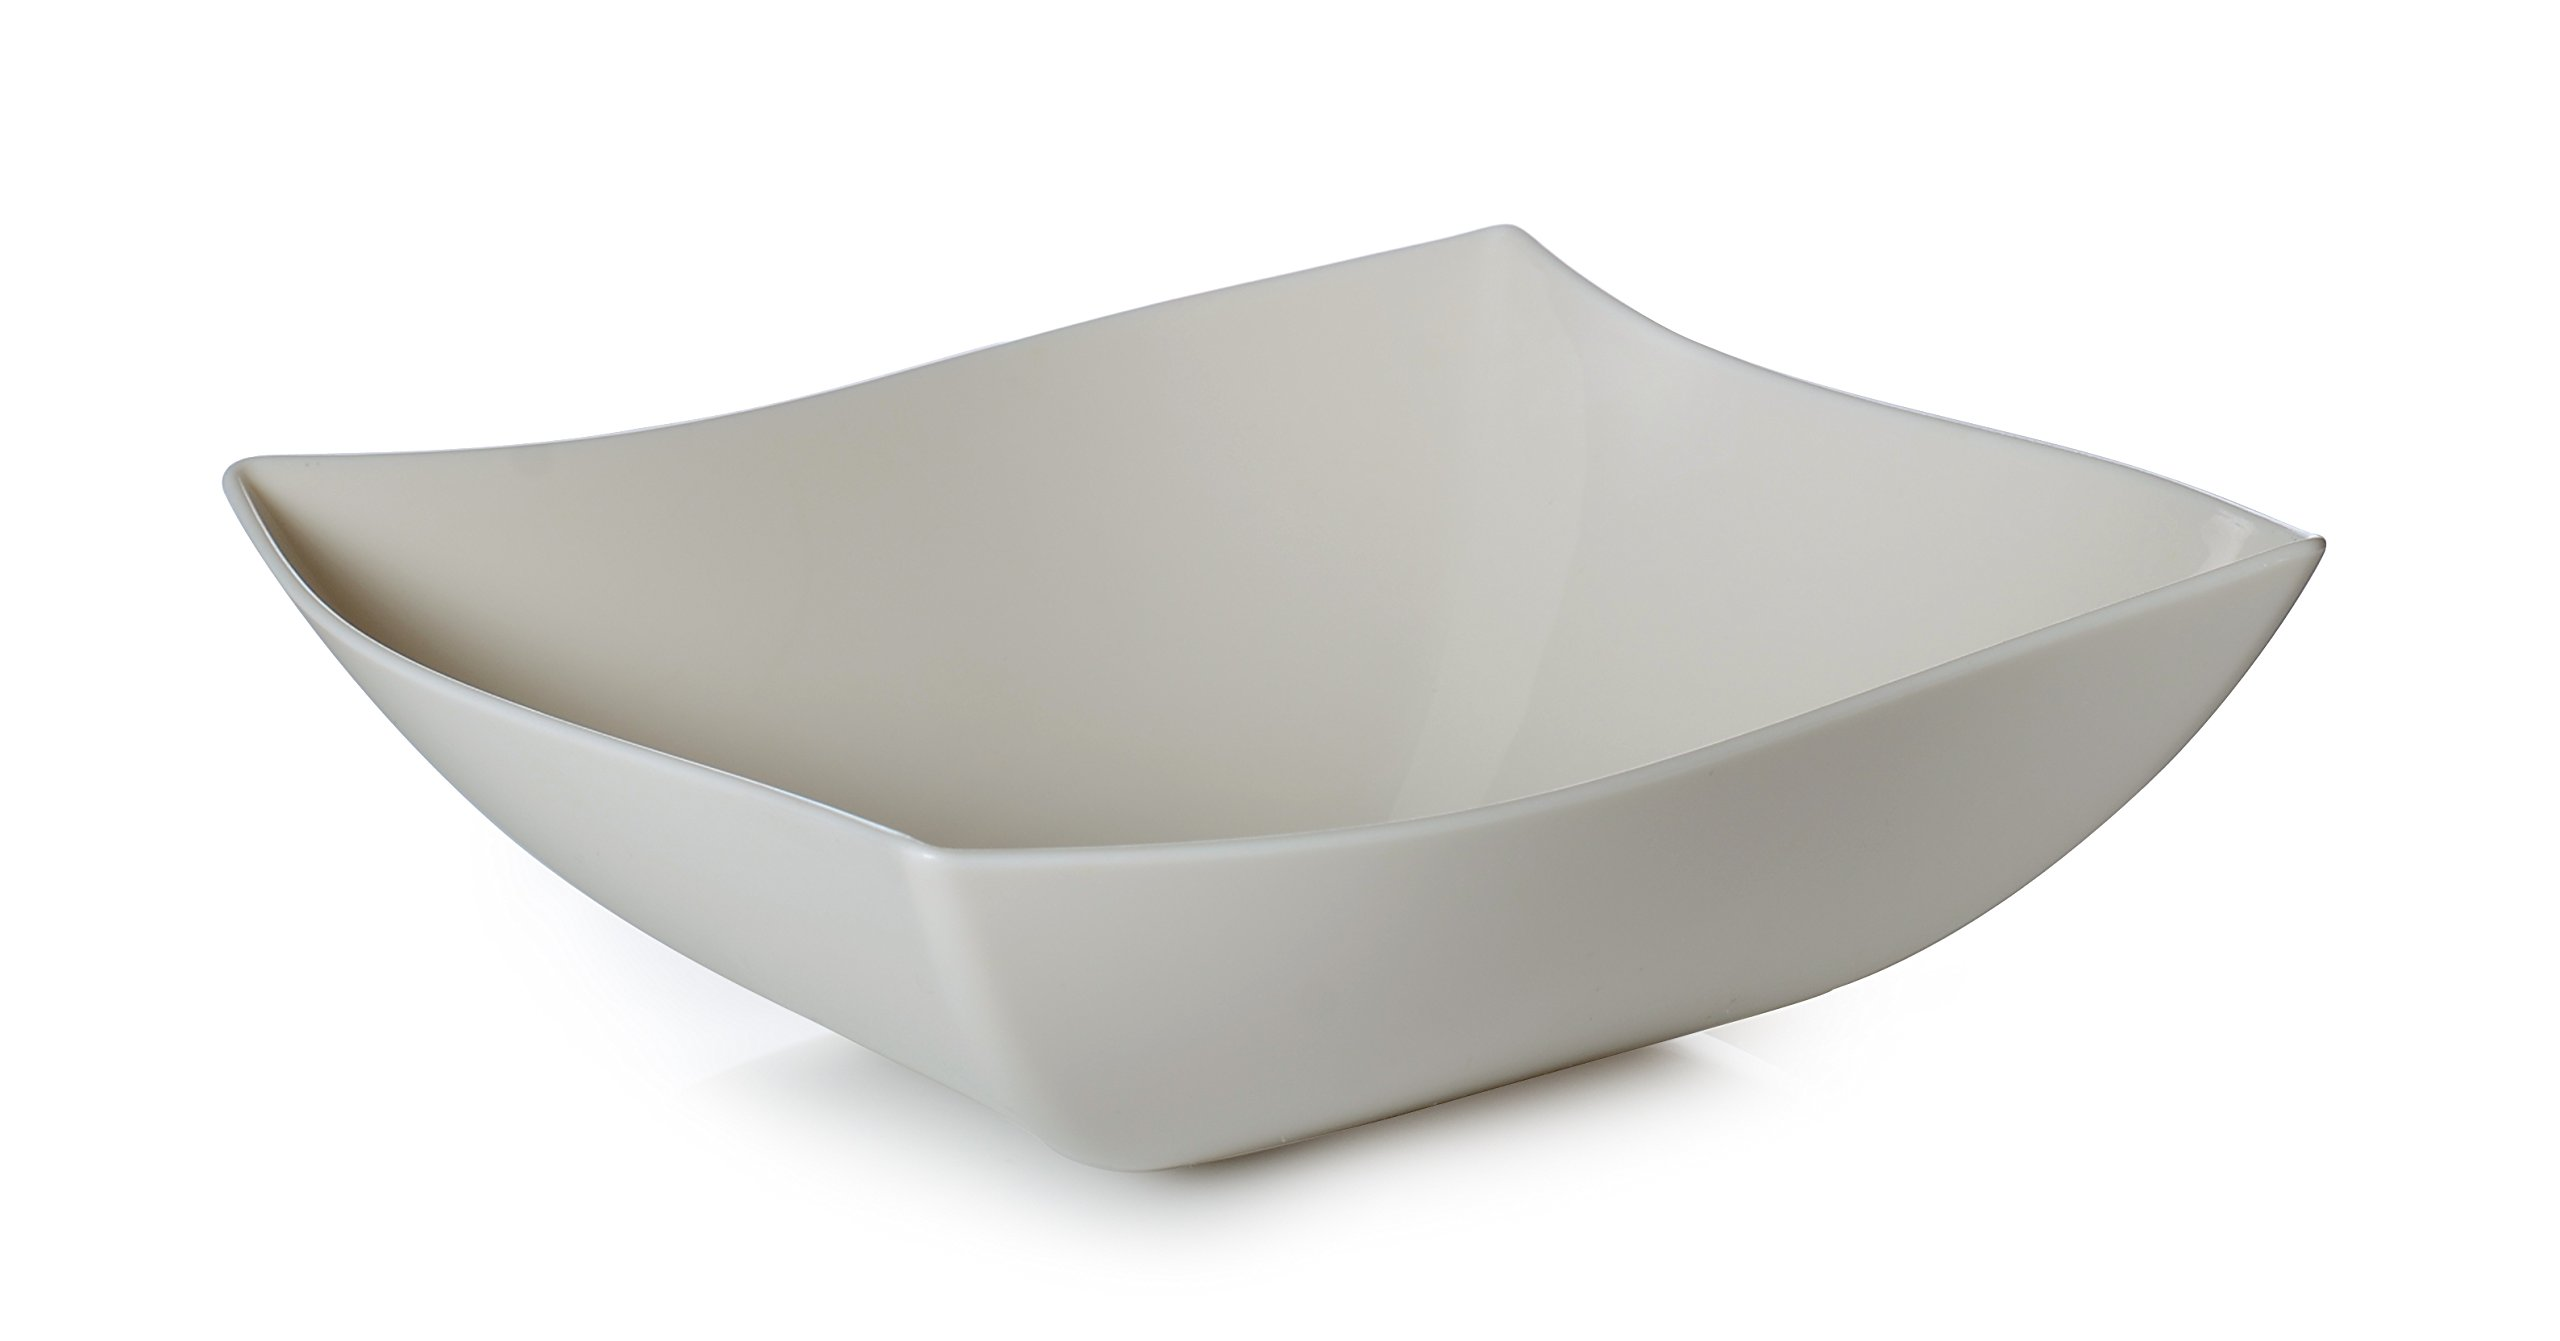 Fineline 128 oz Serving Bowl (Case of 25), Bone